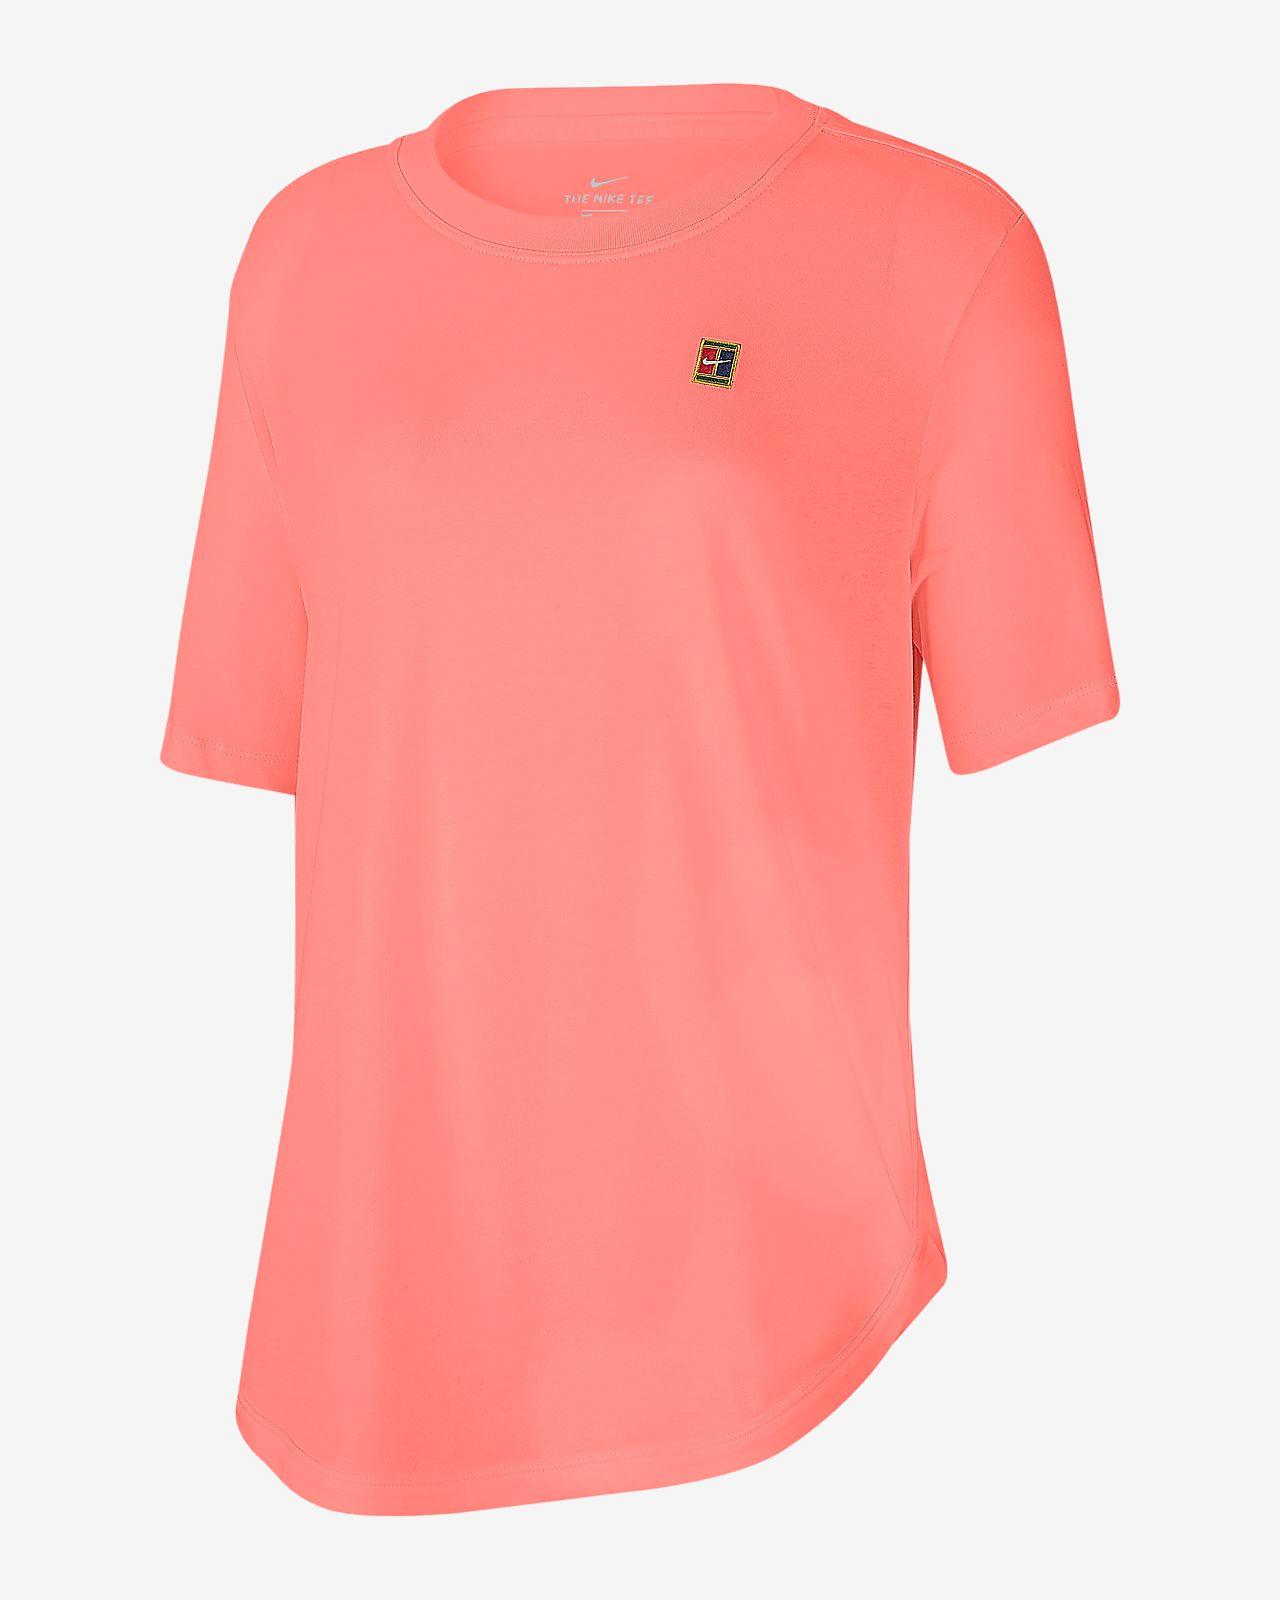 Tee shirt de tennis NikeCourt pour Femme